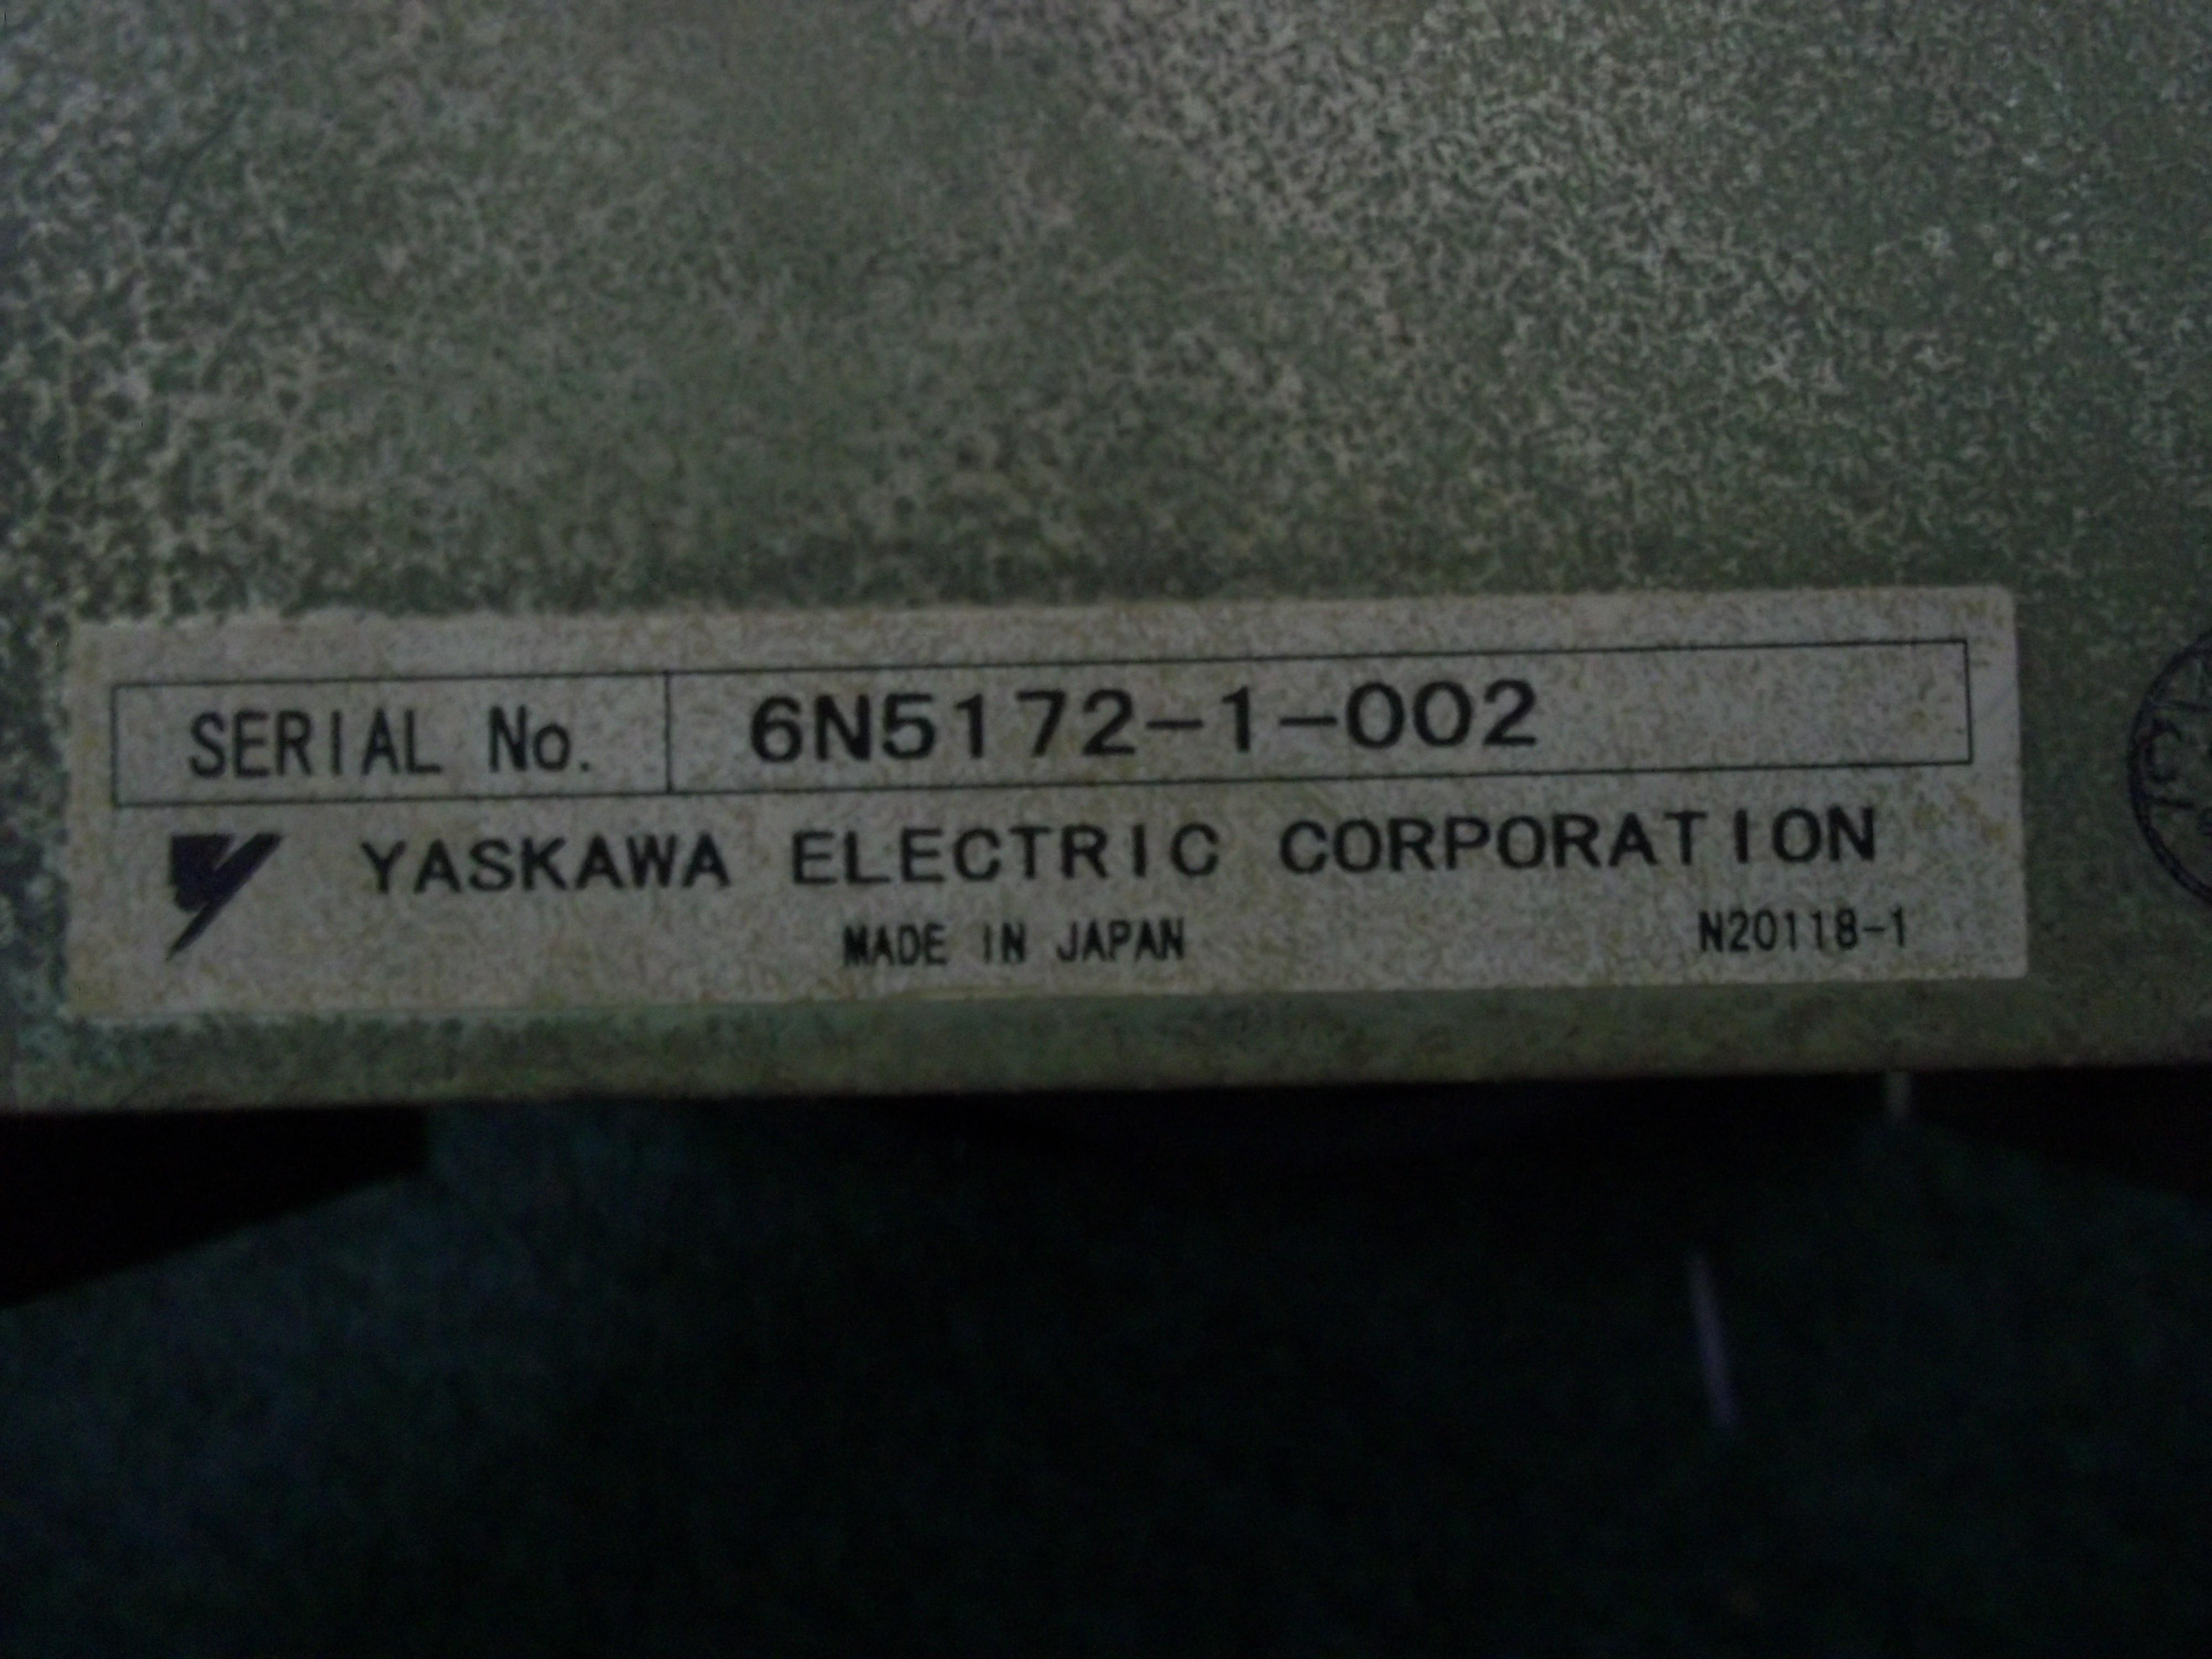 Repair CPCR-MR-CA-05D-C SERVO YASKAWA ELECTRIC CORPORATION (SERVOPACK)  in Malaysia, Singapore, Thailand, Indonesia